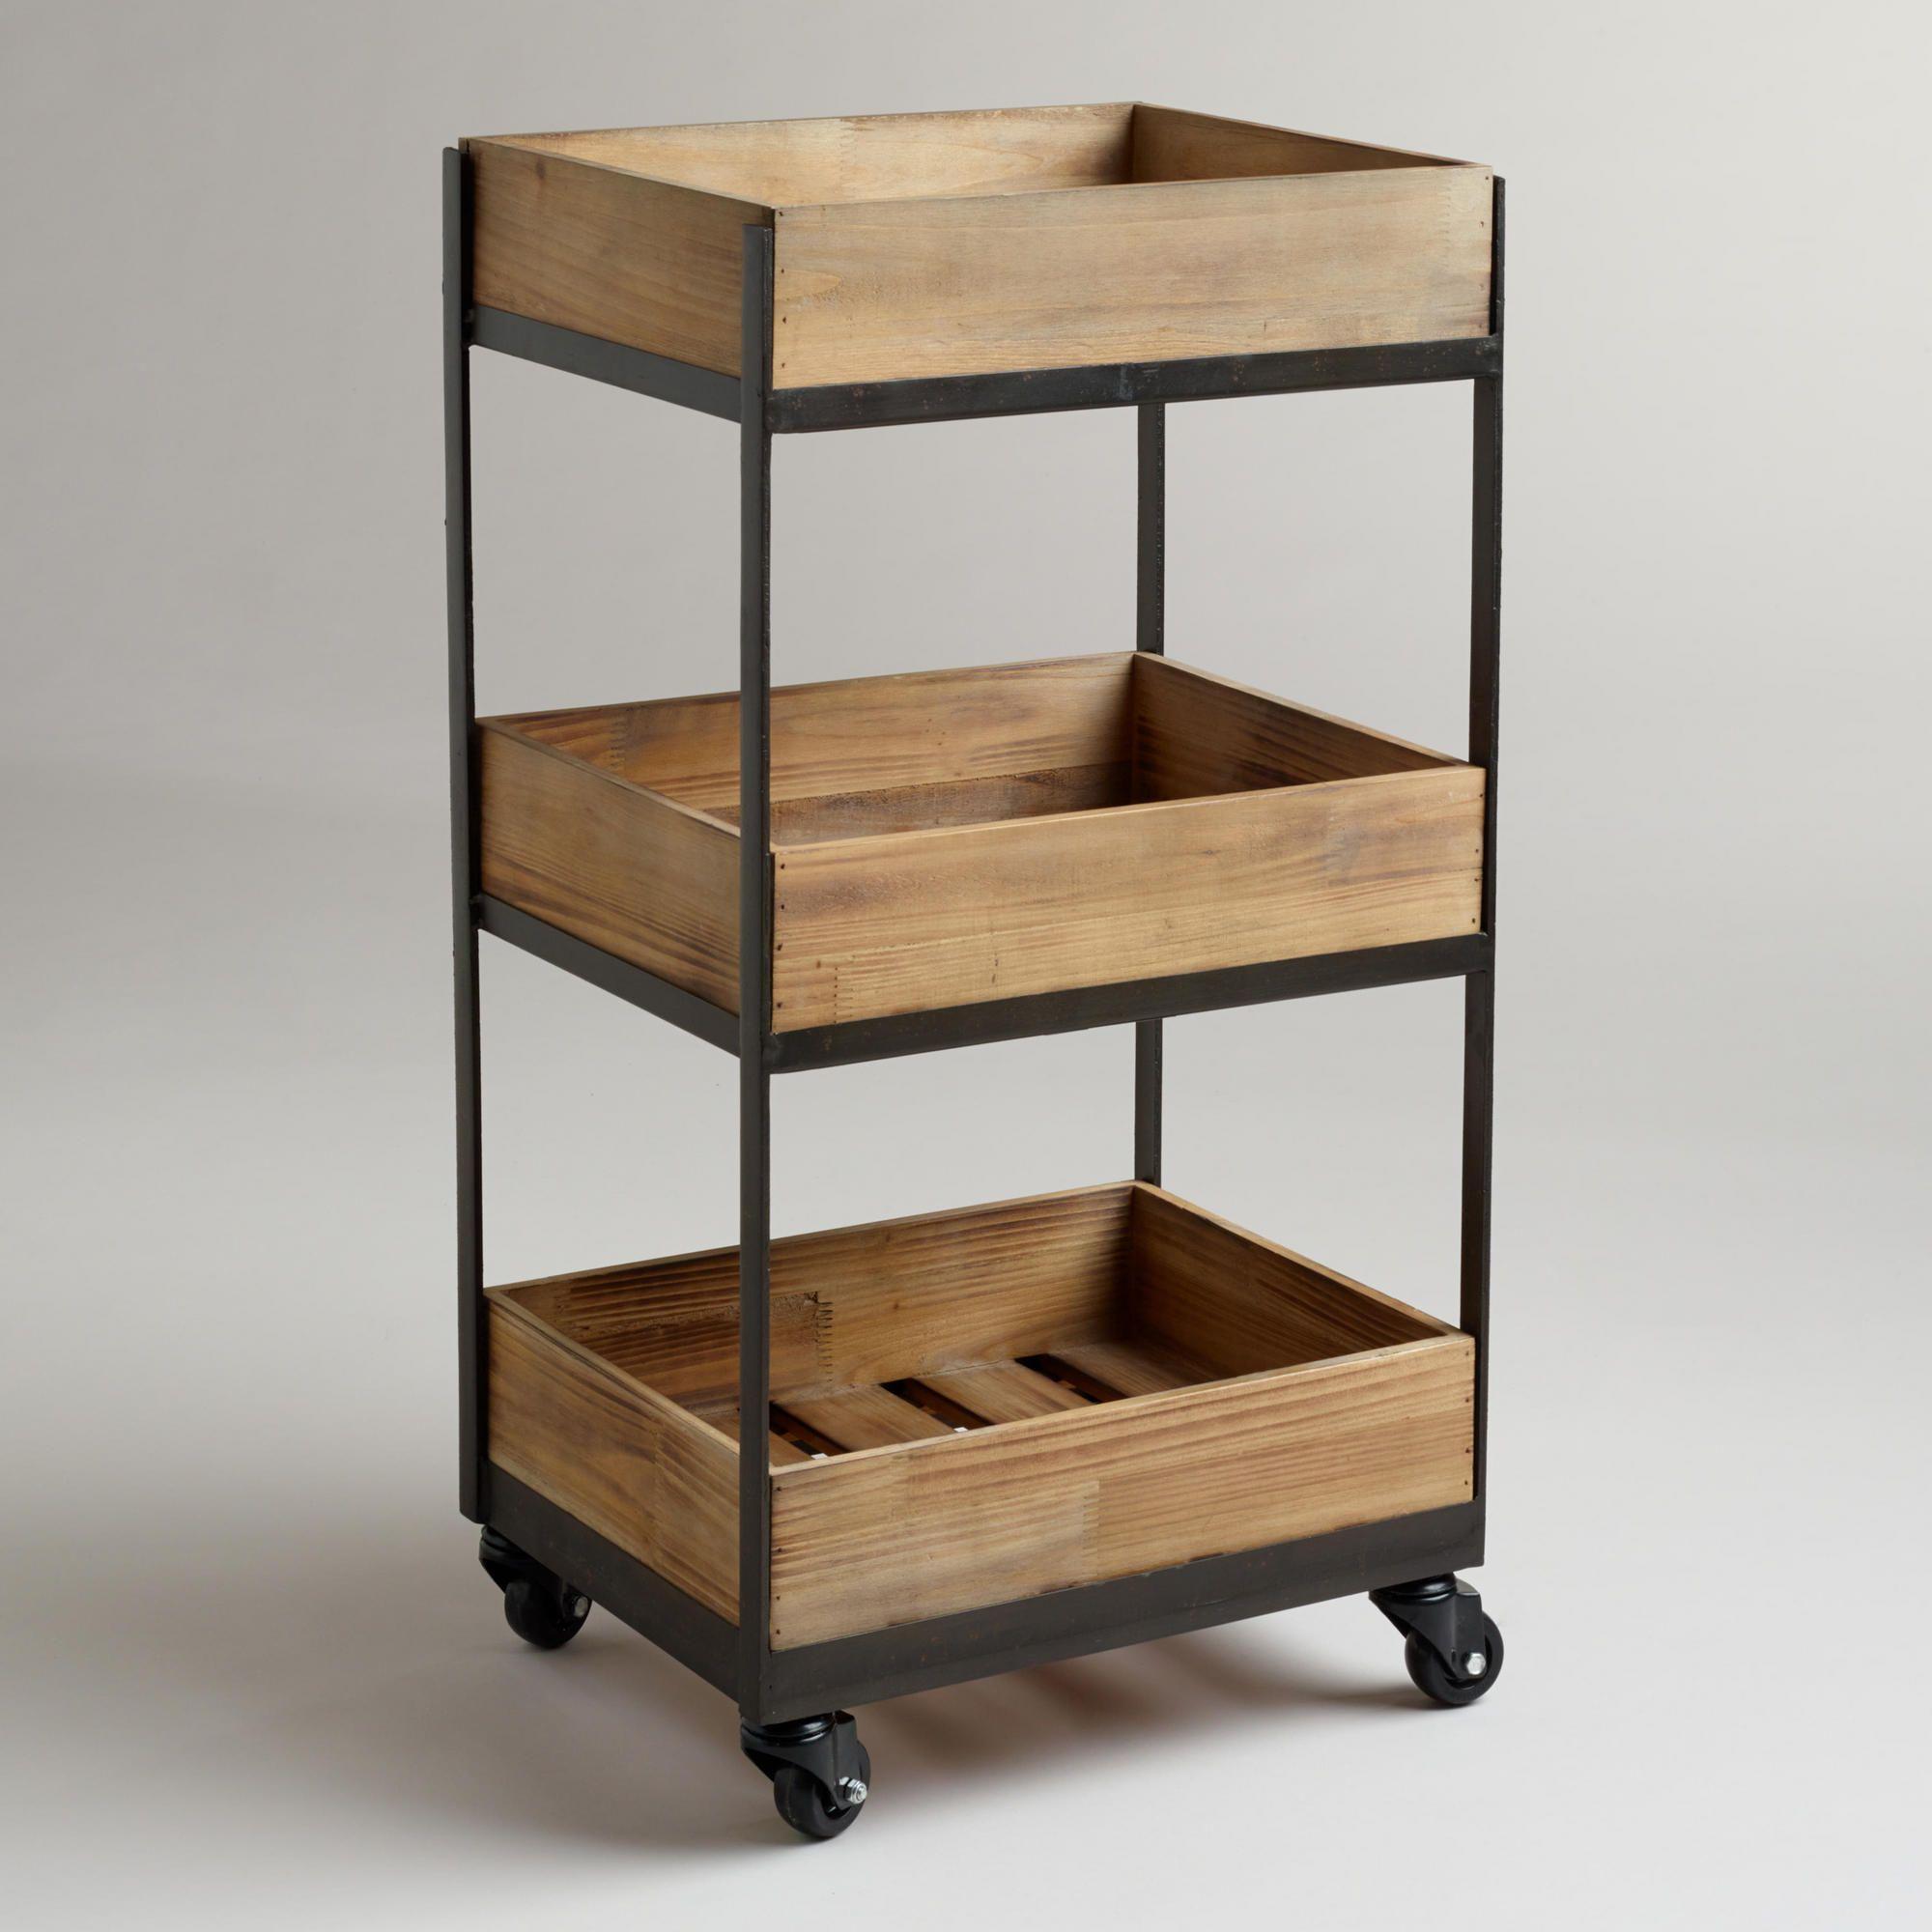 Wood 4 Tier Gavin Rolling Cart Muebles hierro y madera